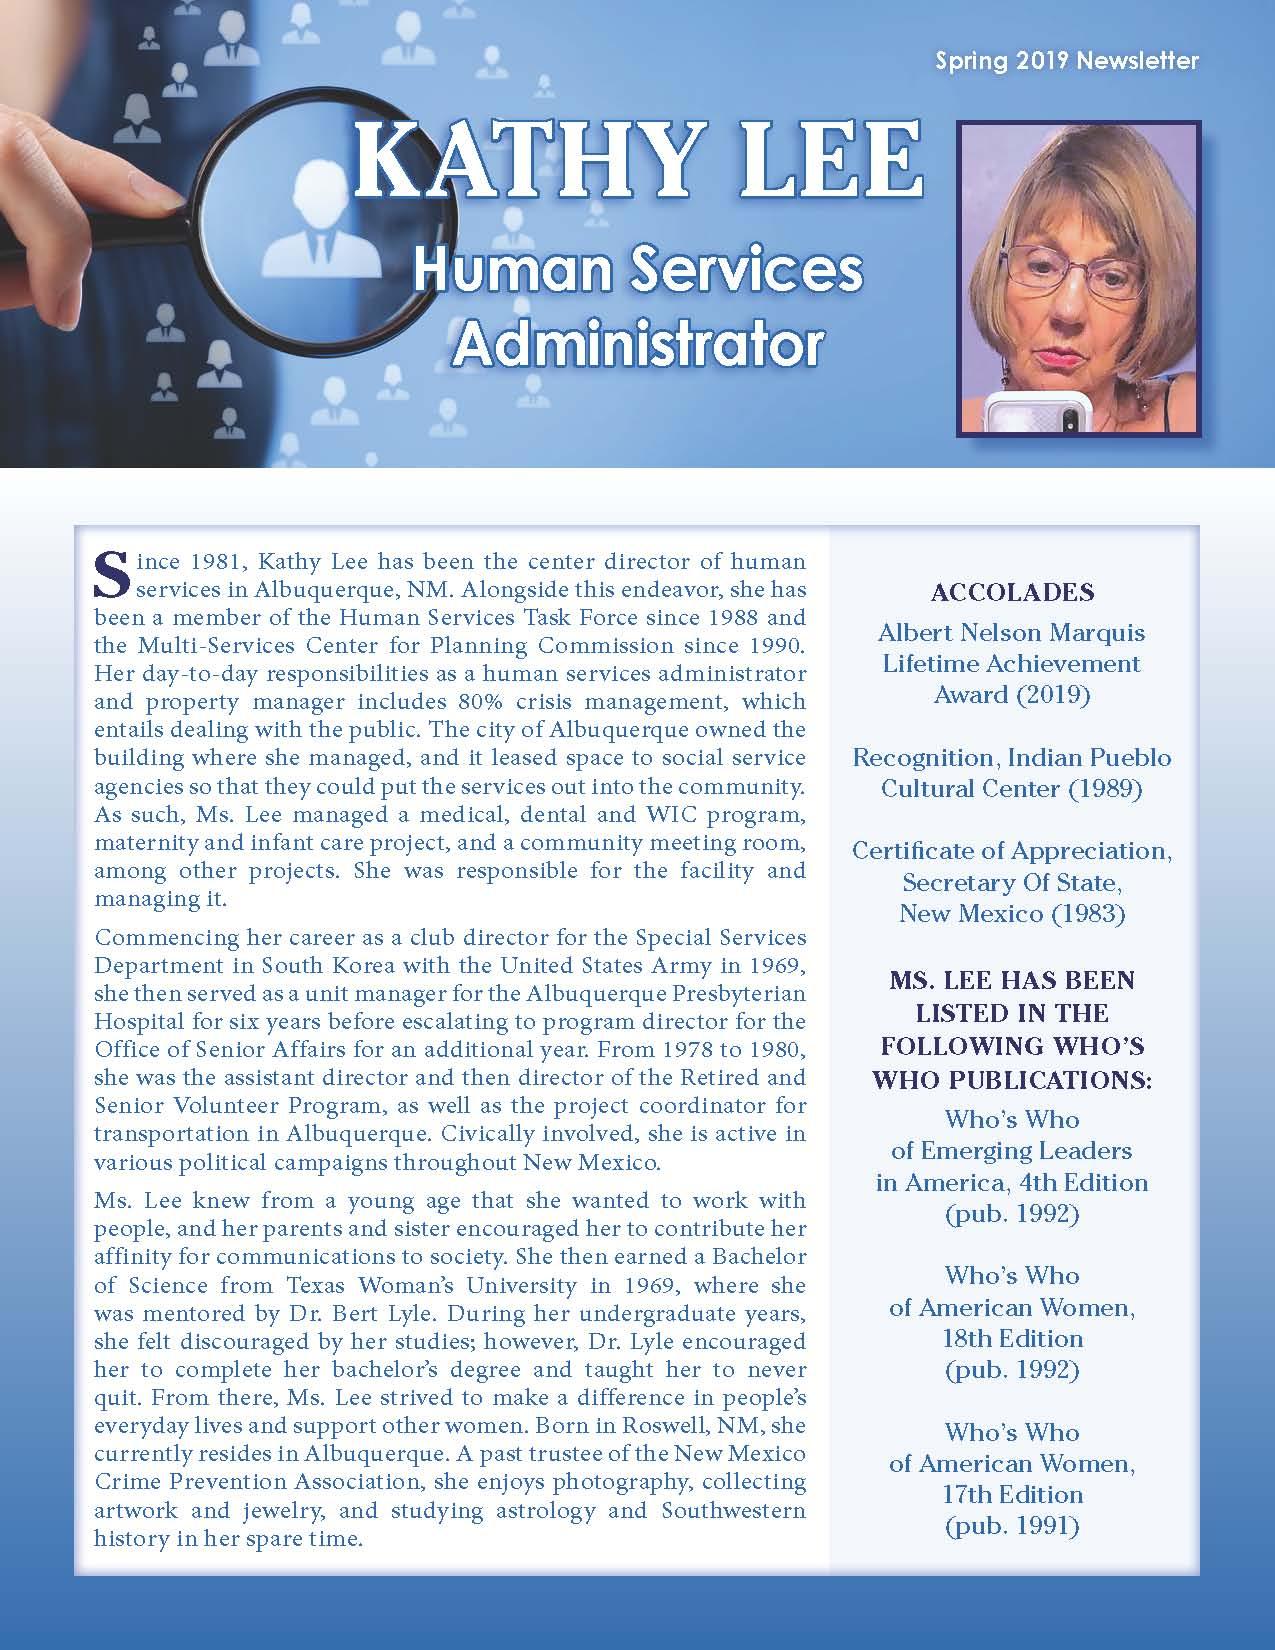 Lee, Kathy 4149135_18604059 Newsletter.jpg